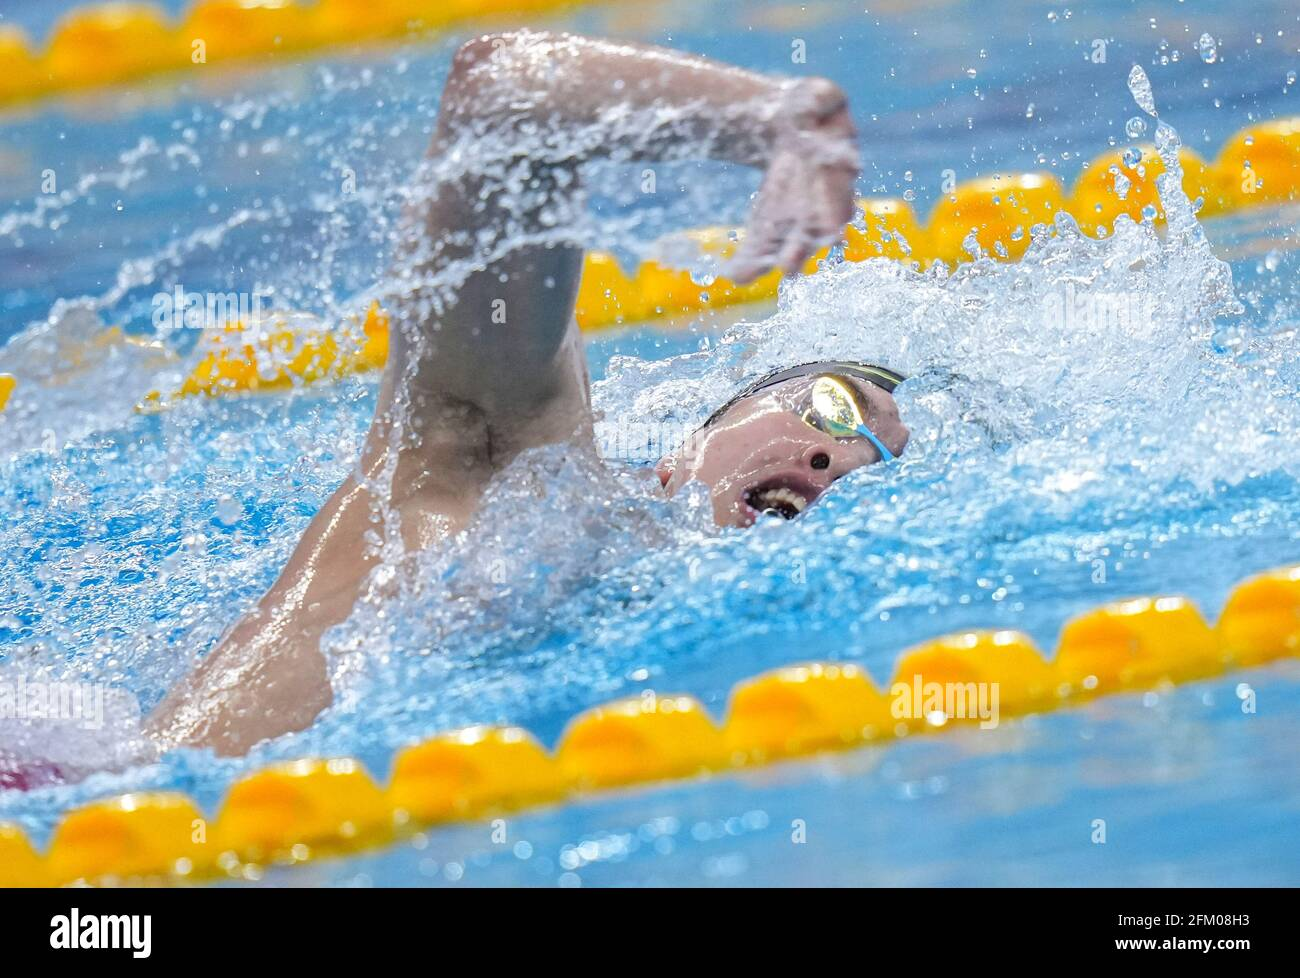 Qingdao, China. 5th de mayo de 2021. Cheng Long of Shandong compite durante la final de estilo libre masculina de 800m en el Campeonato Nacional Chino de Natación de 2021 en Qingdao, China oriental, 5 de mayo de 2021. Crédito: Xu Chang/Xinhua/Alamy Live News Foto de stock